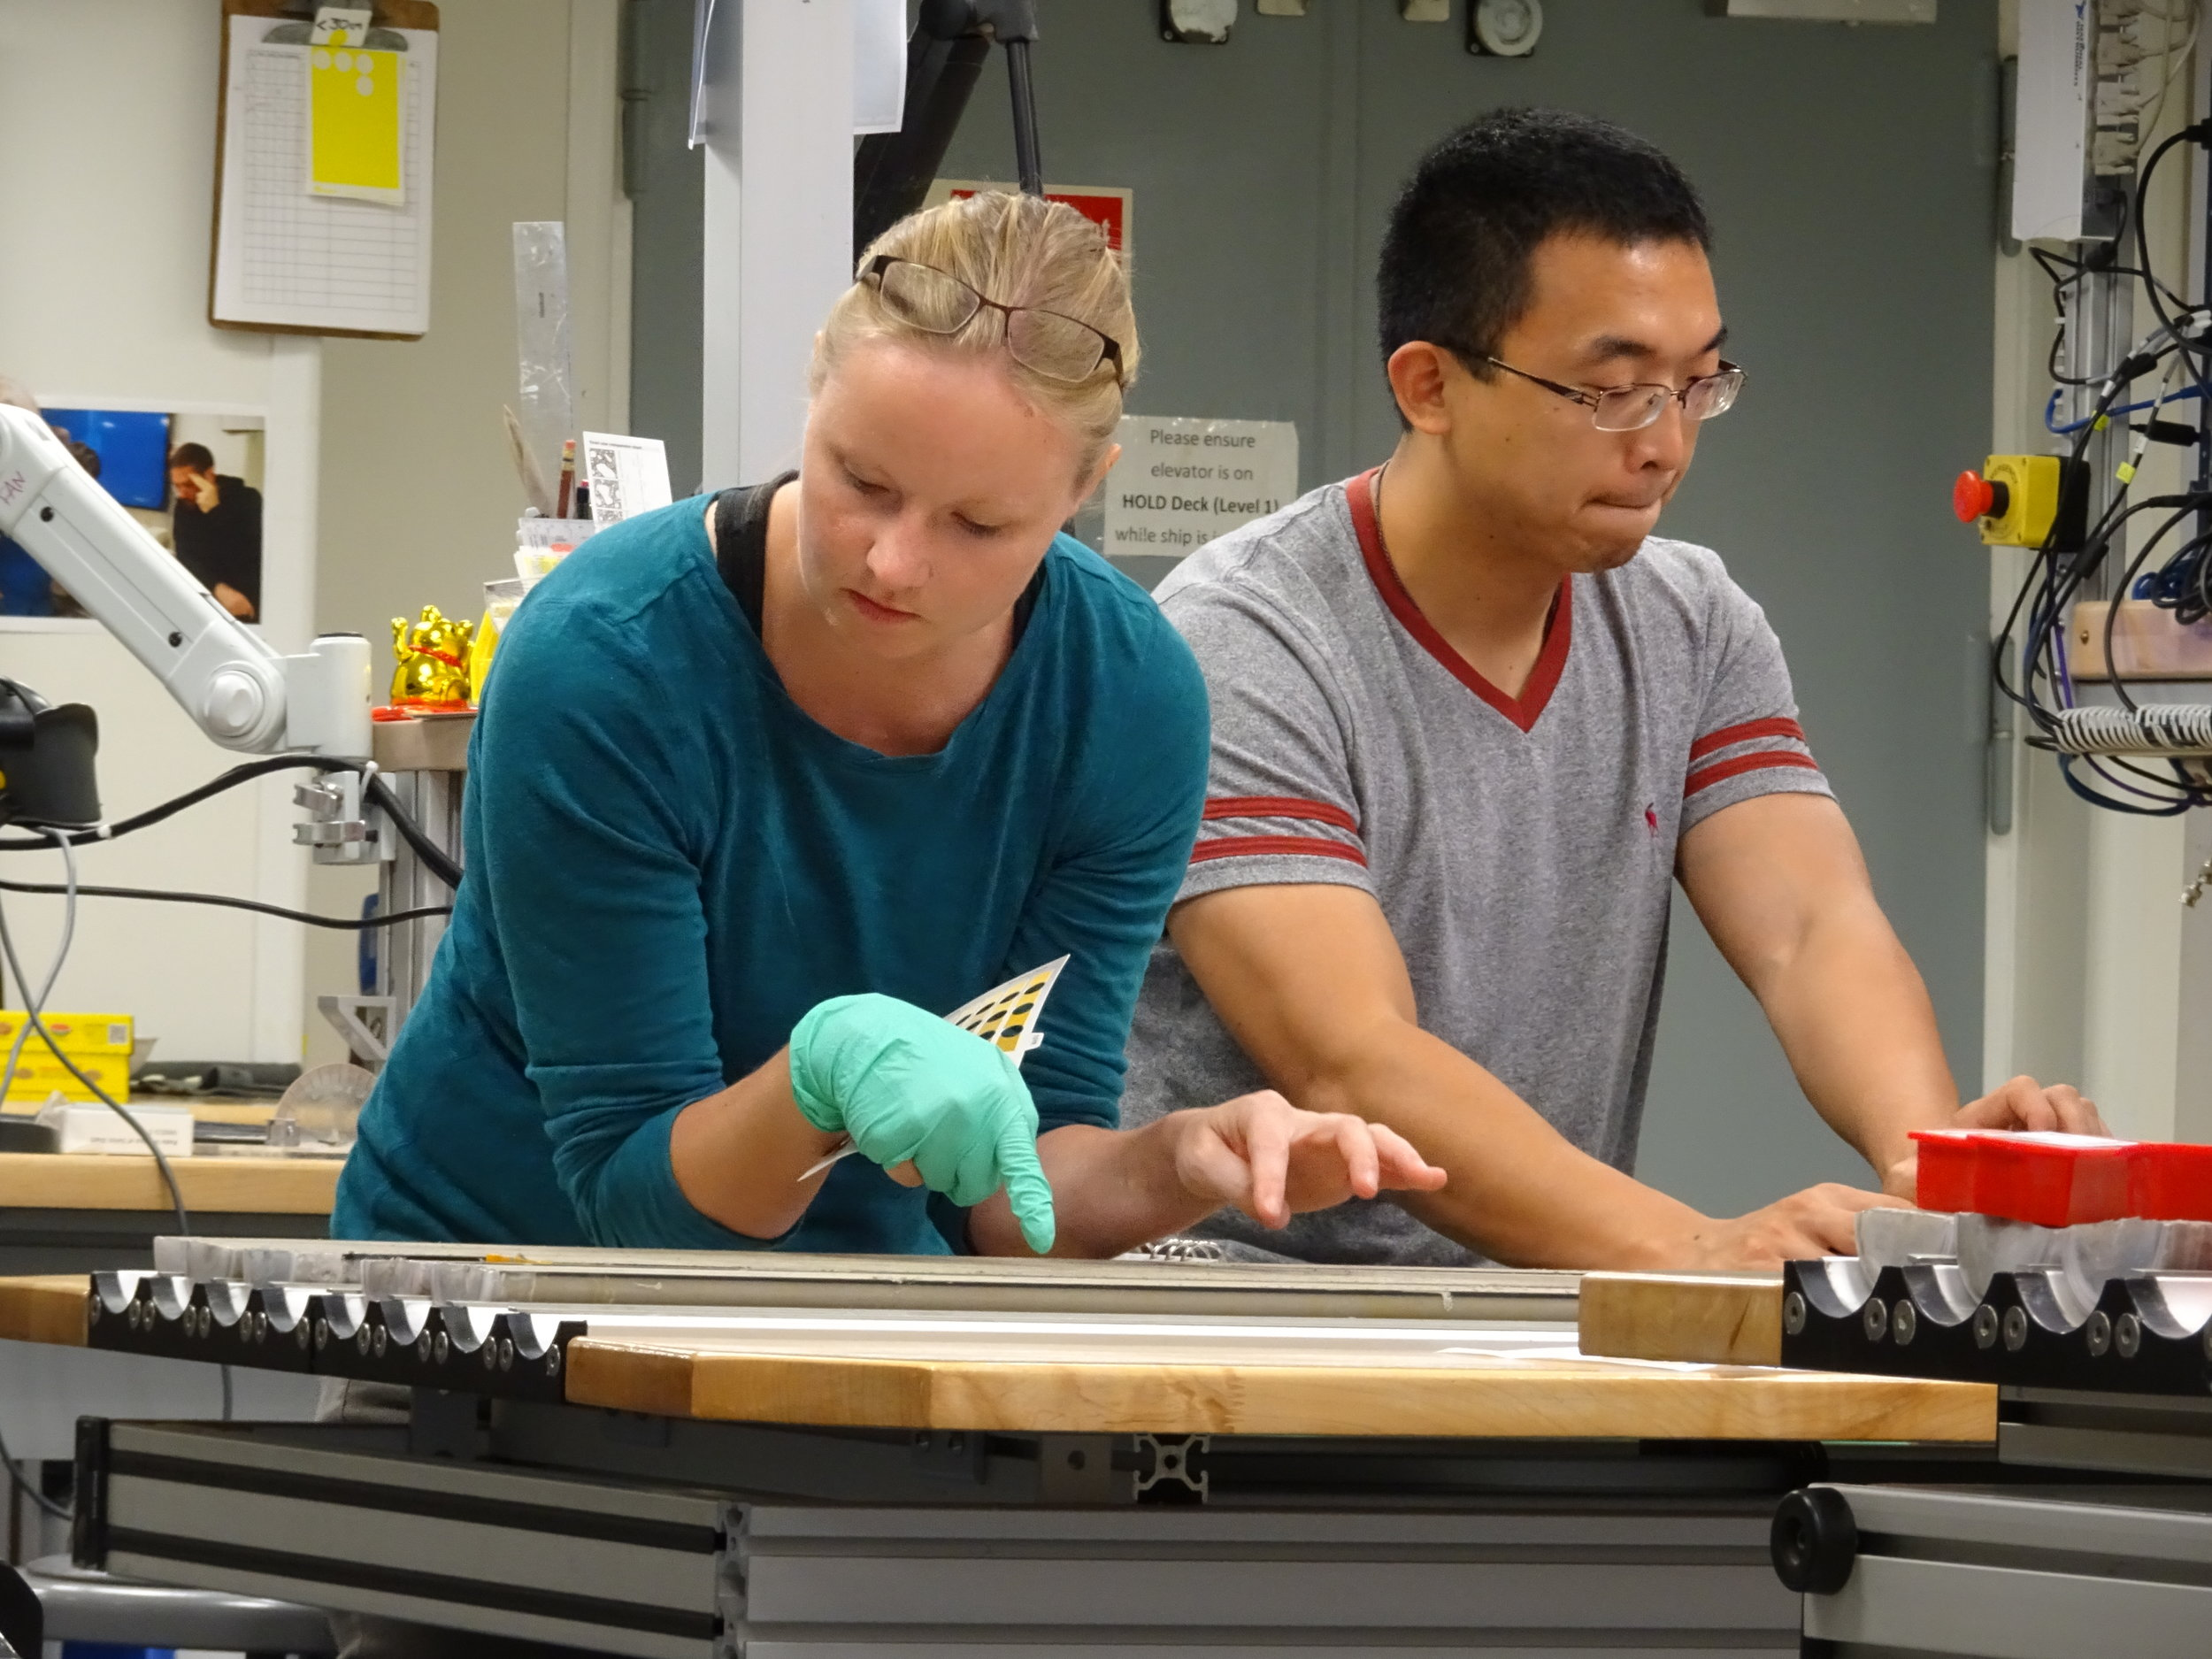 Dr. Julie Schindlbeck and Chang Liu are describing cores from the sea floor. Photo credit: Froukje van der Zwan,IODP.